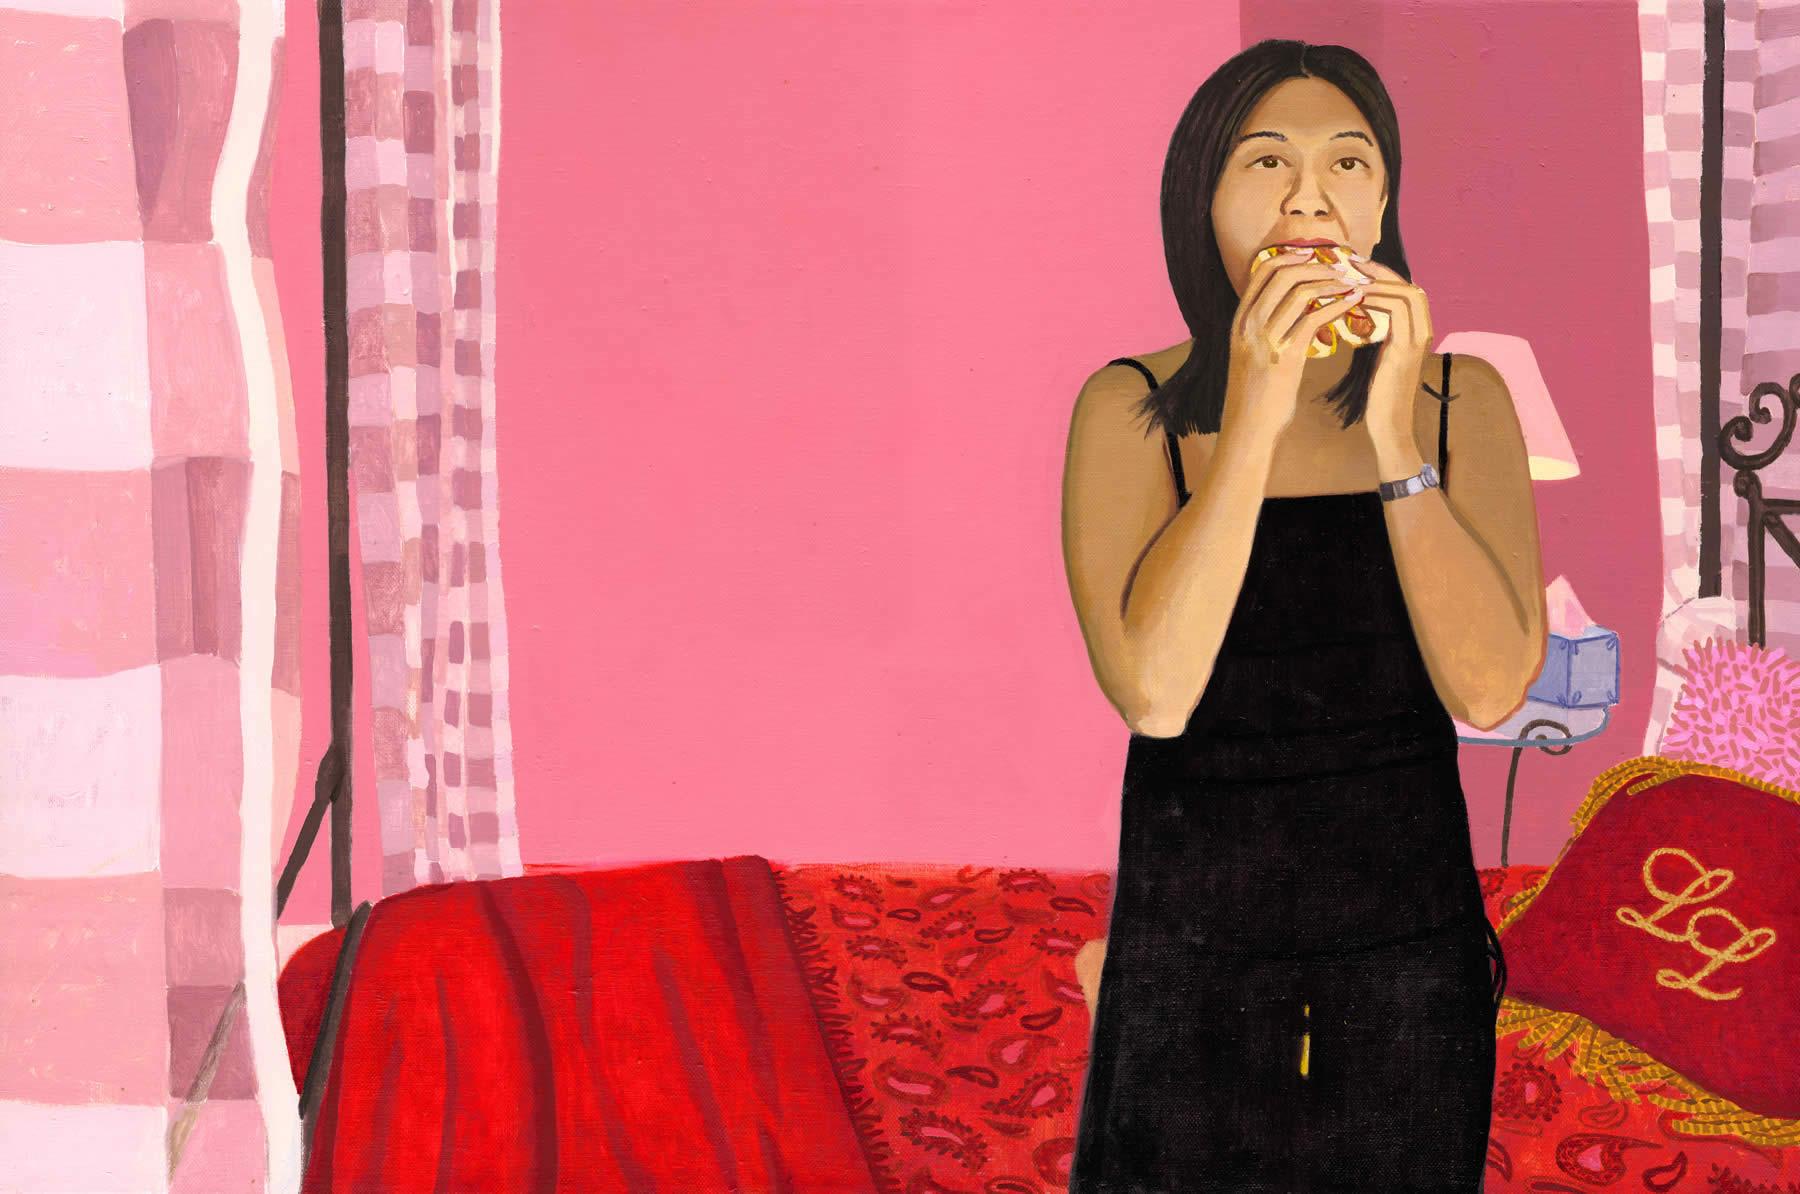 Woman Eating Two Hotdogs